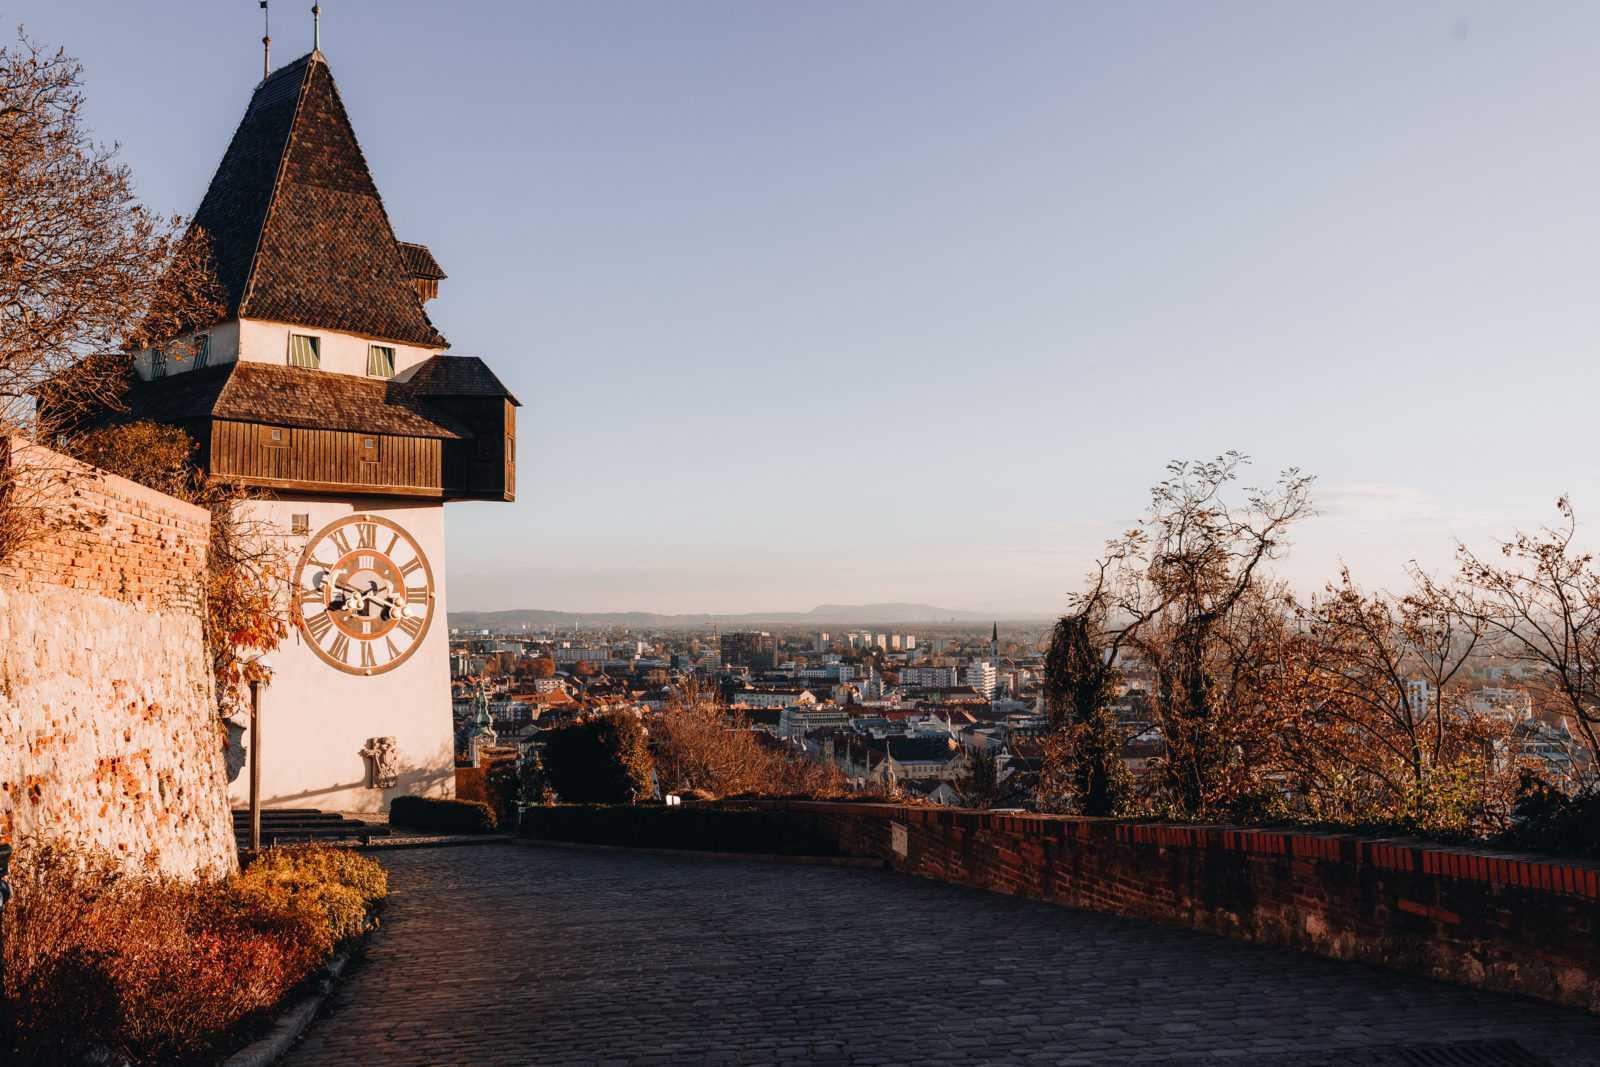 Turm Uhr Berg Graz